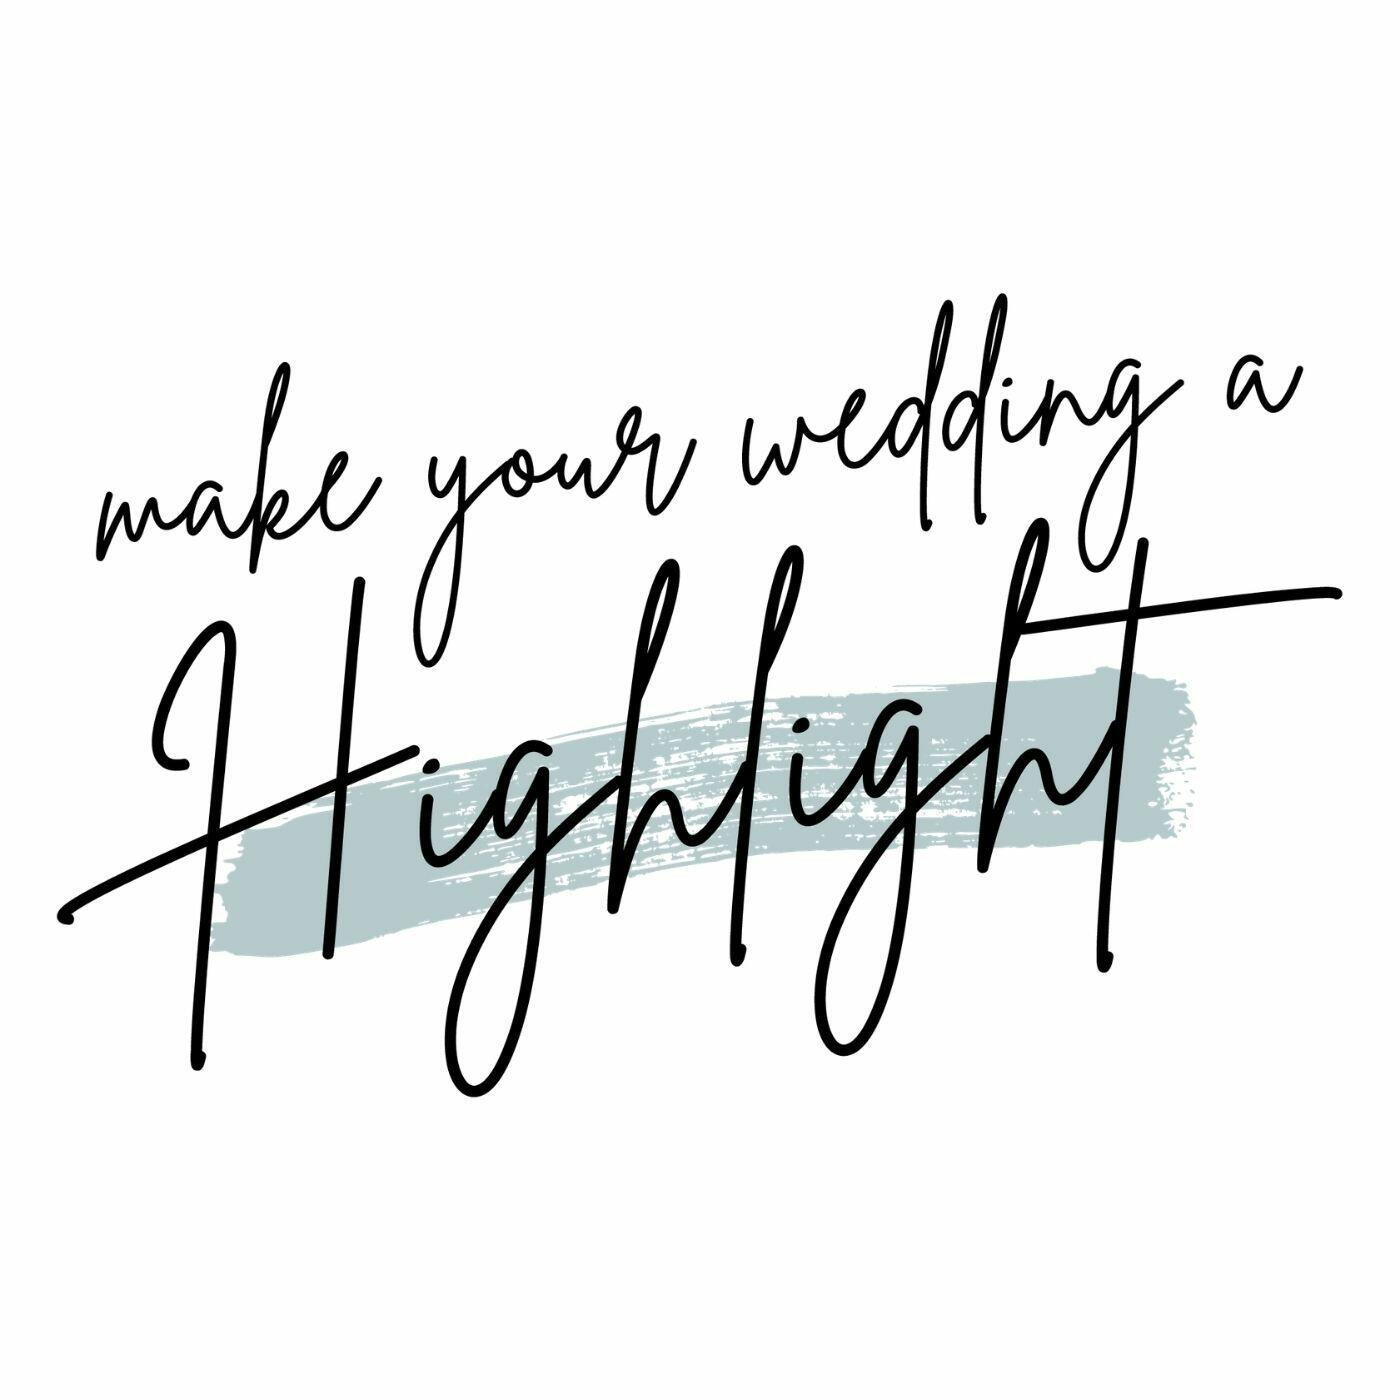 Make Your Wedding a Highlight